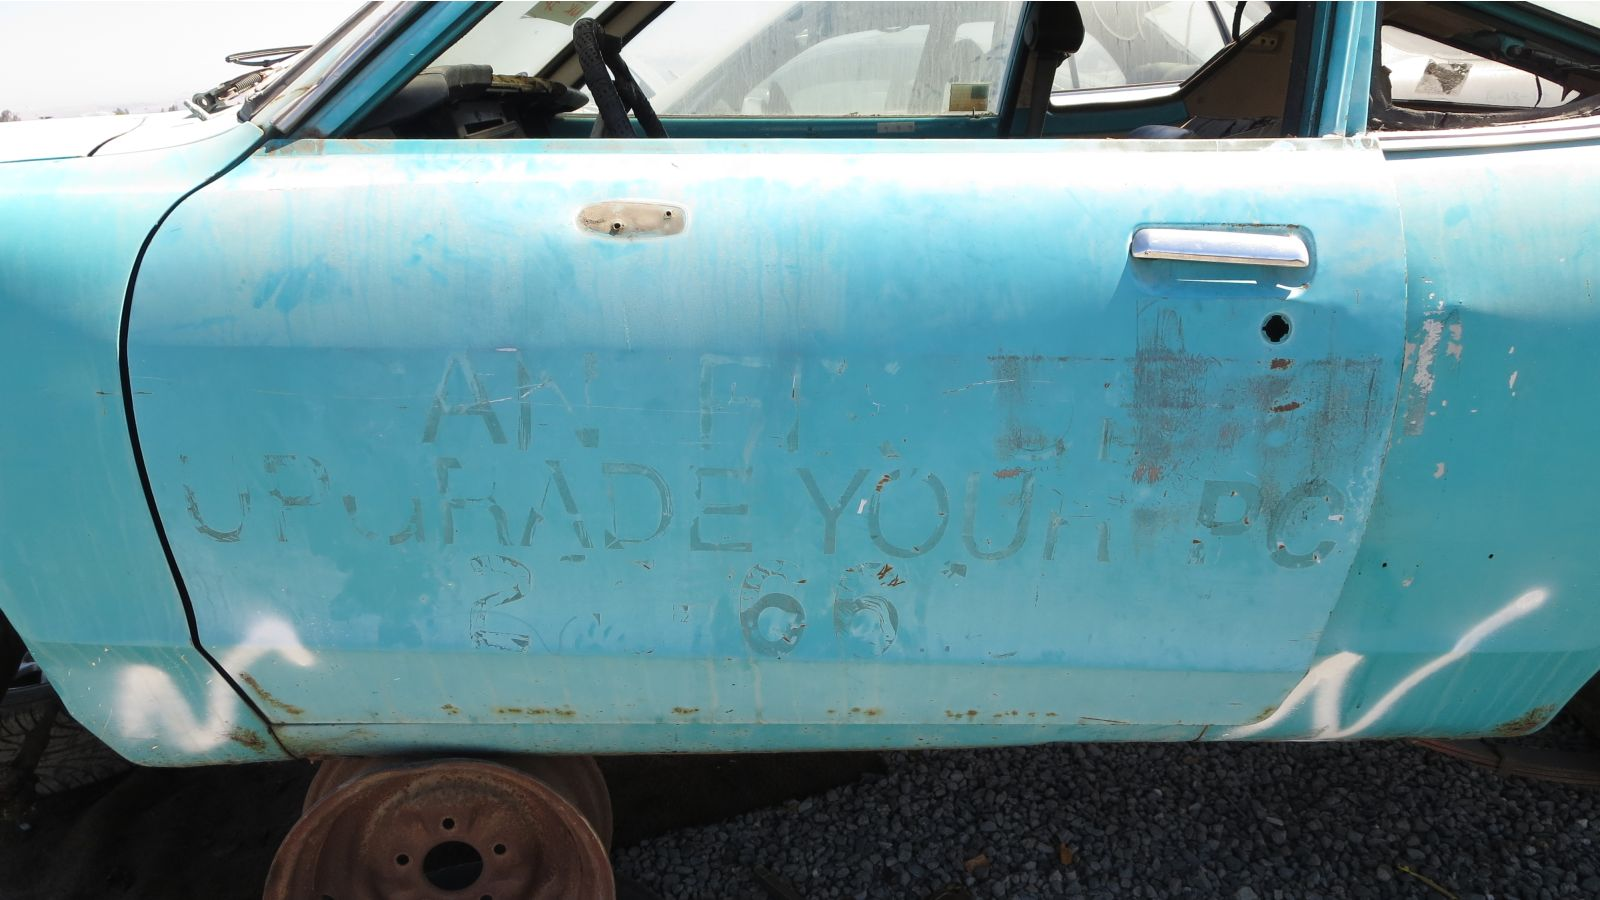 Junkyard gem 1974 datsun b210 fastback autoblog for Honda civic a13 service